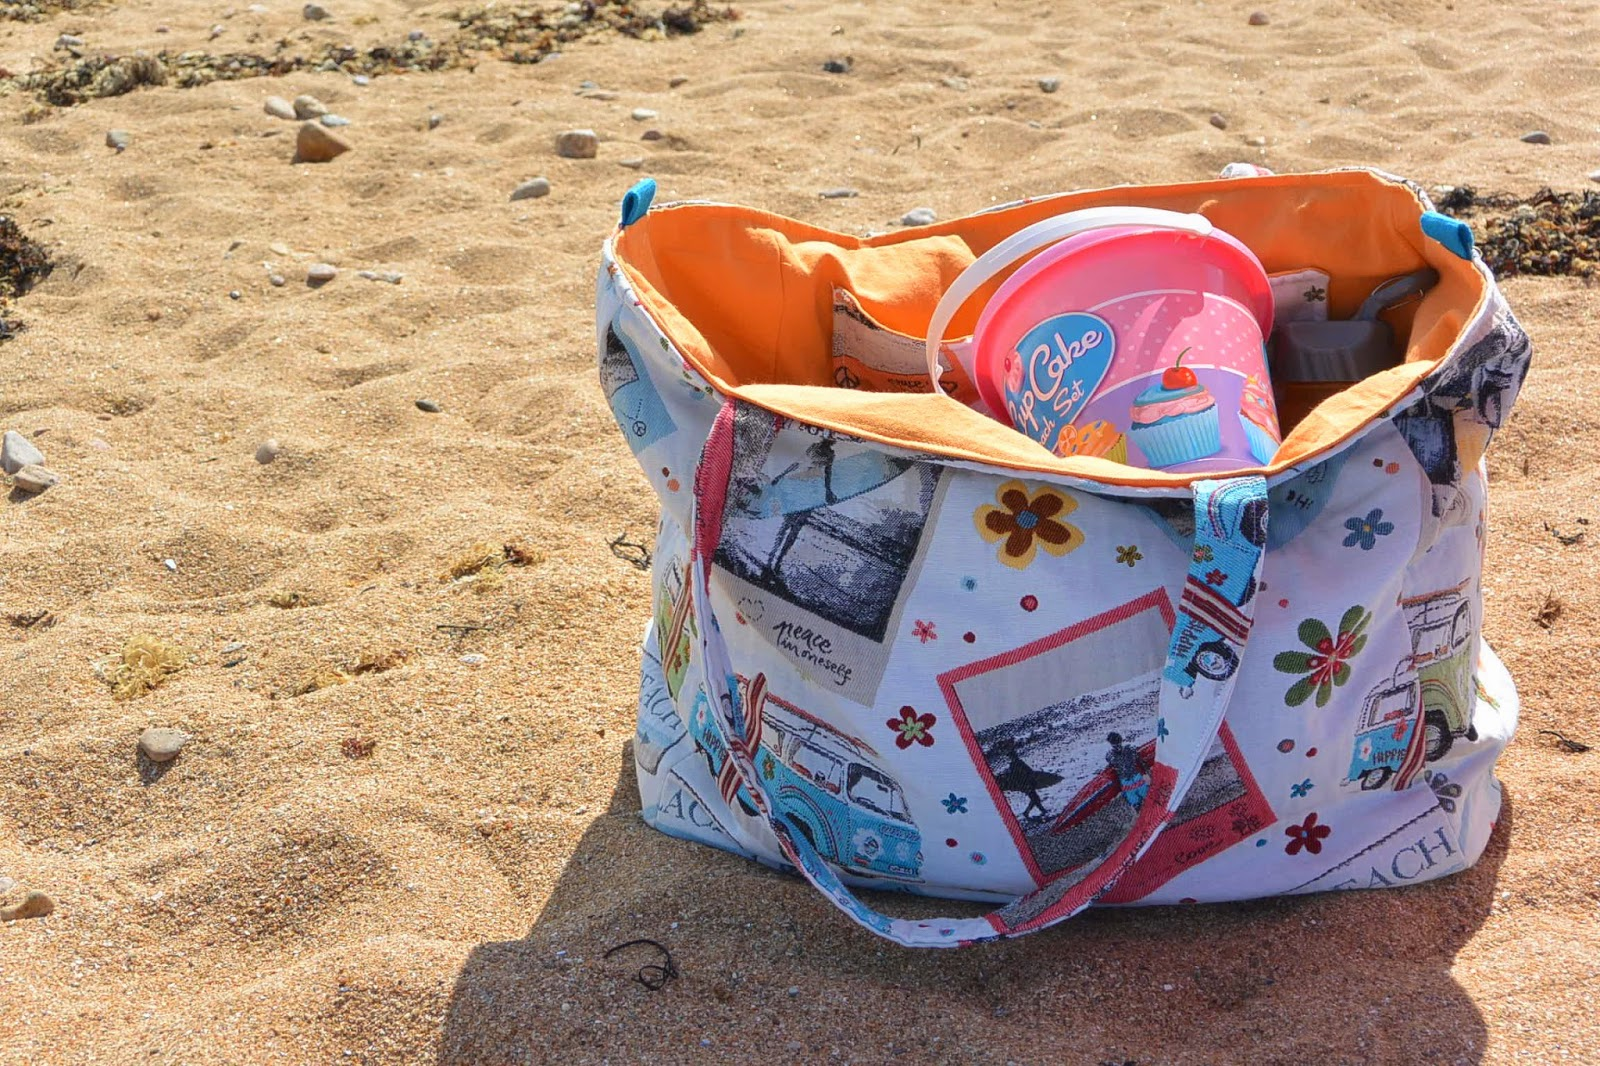 Gros sac de plage esprit surf californie